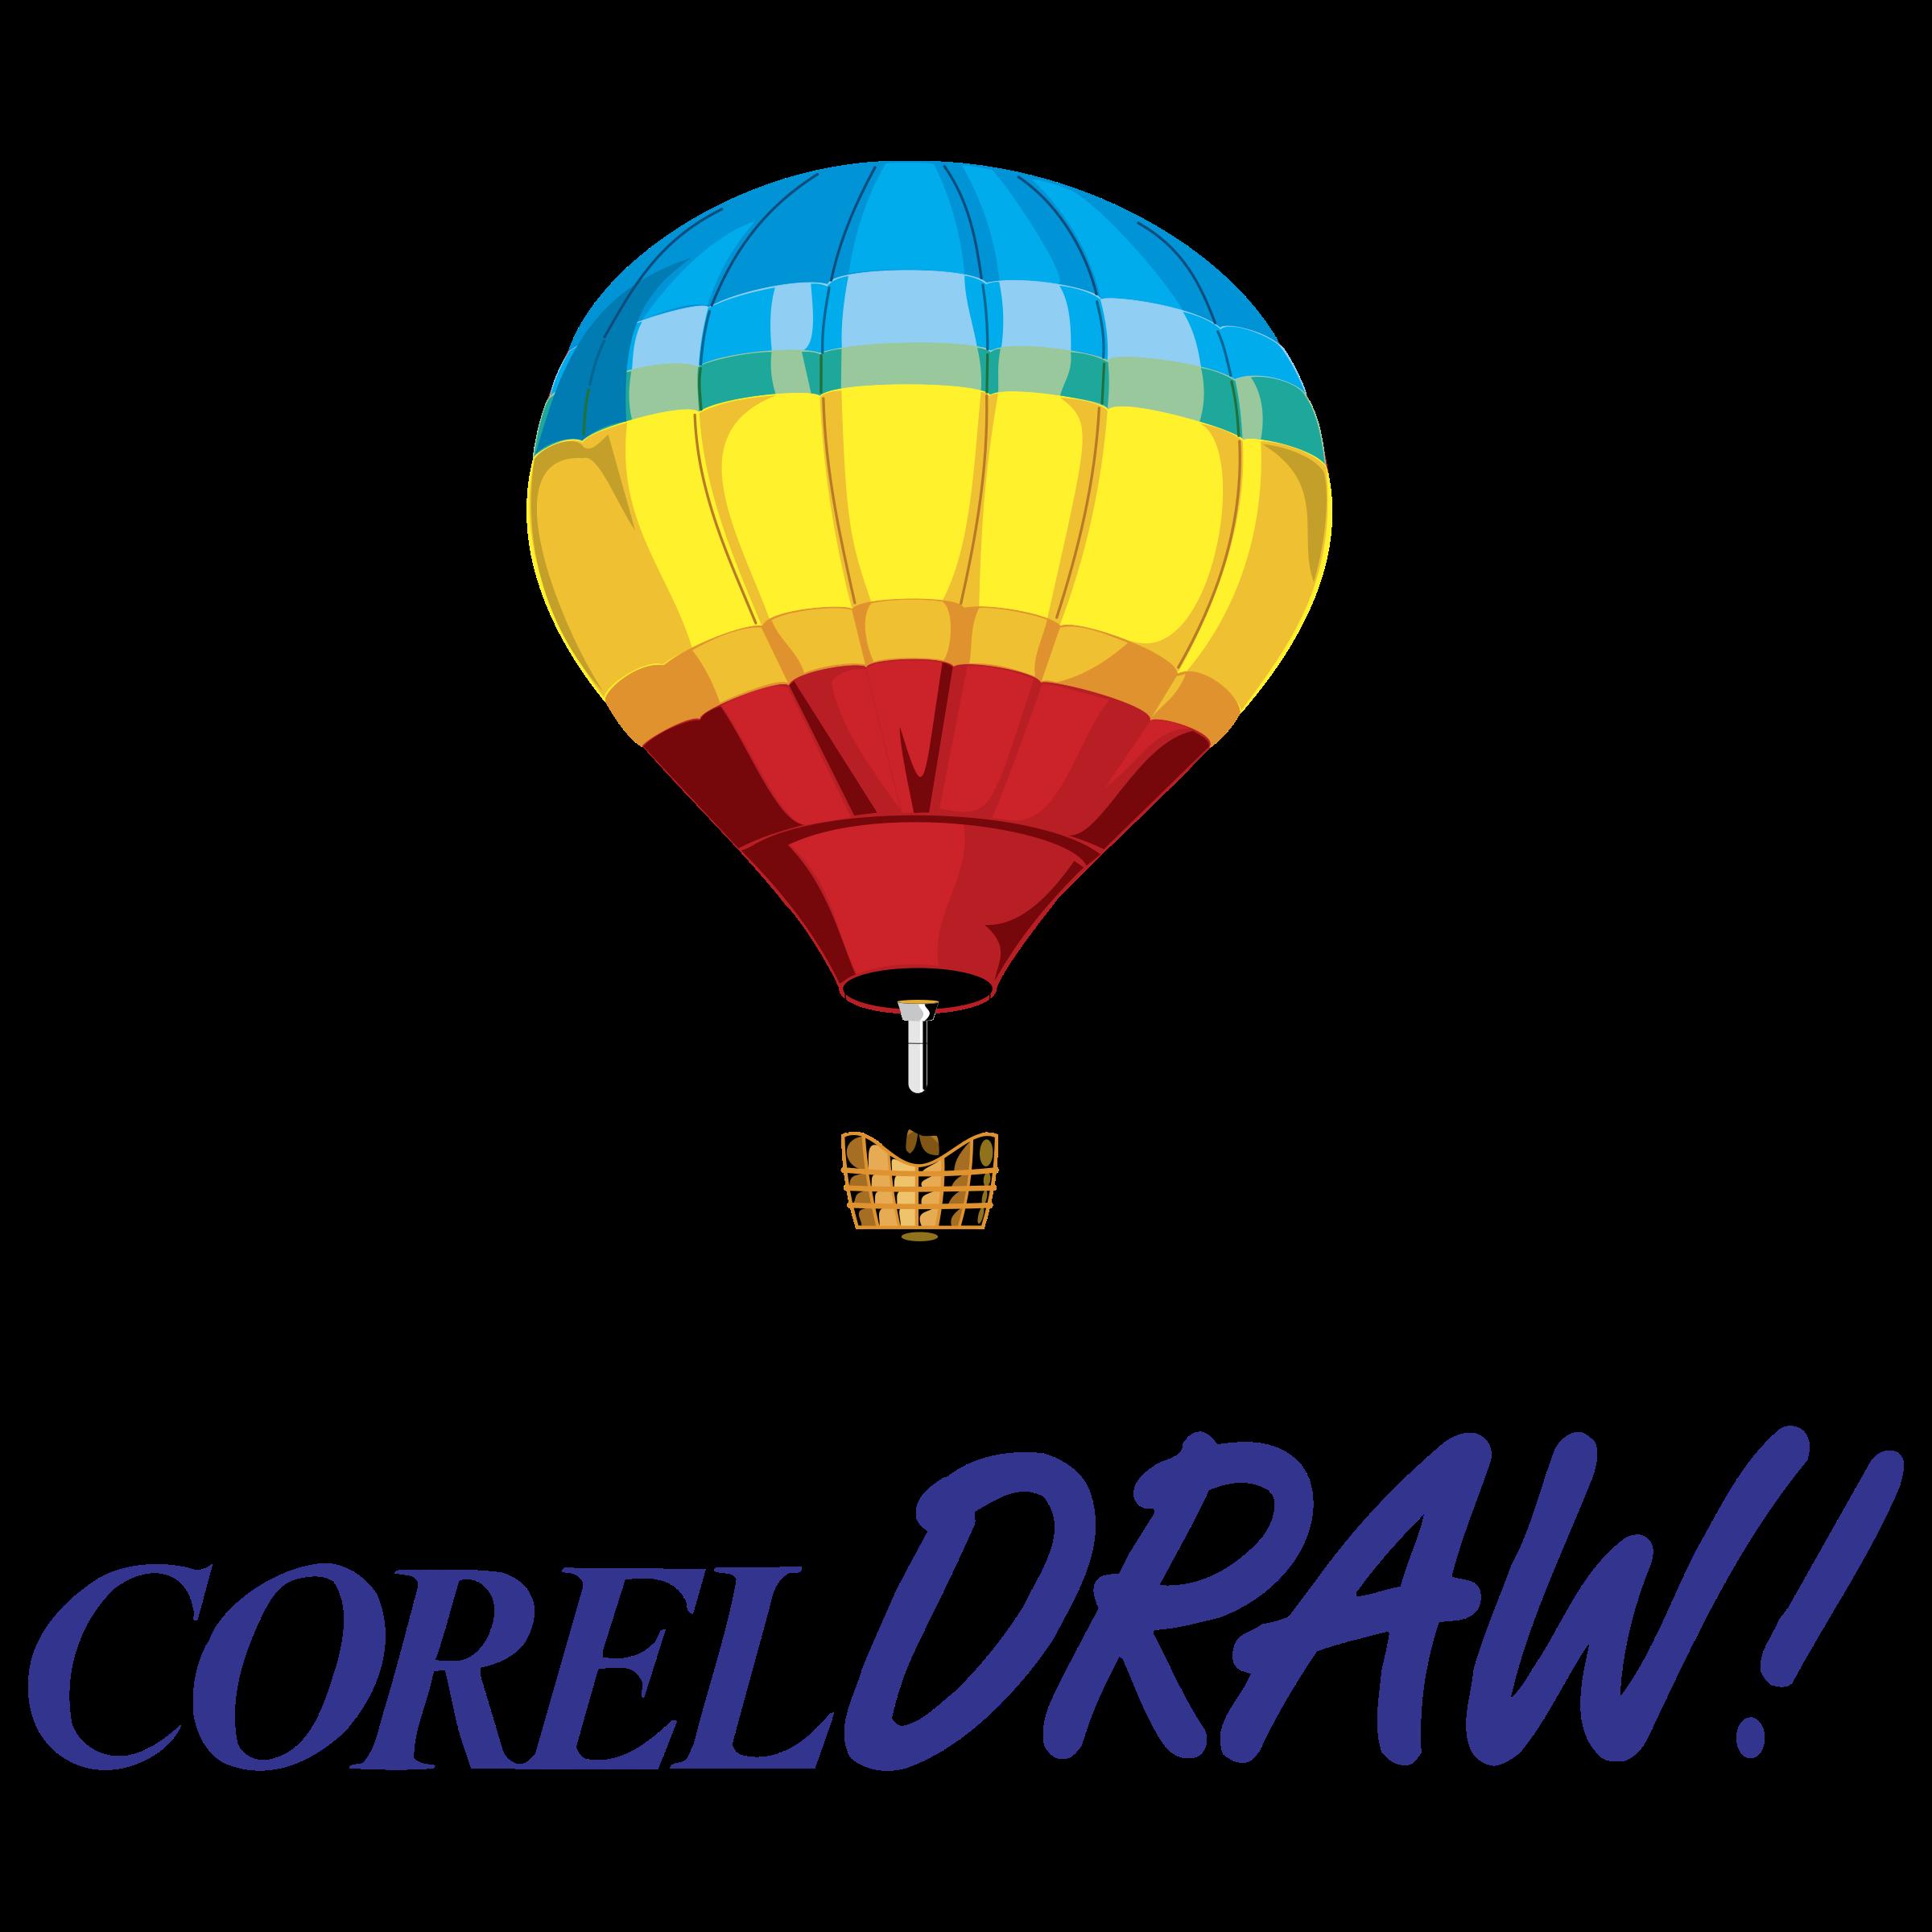 Coreldraw Logo Png Transparent Svg Vector Freebie Supply